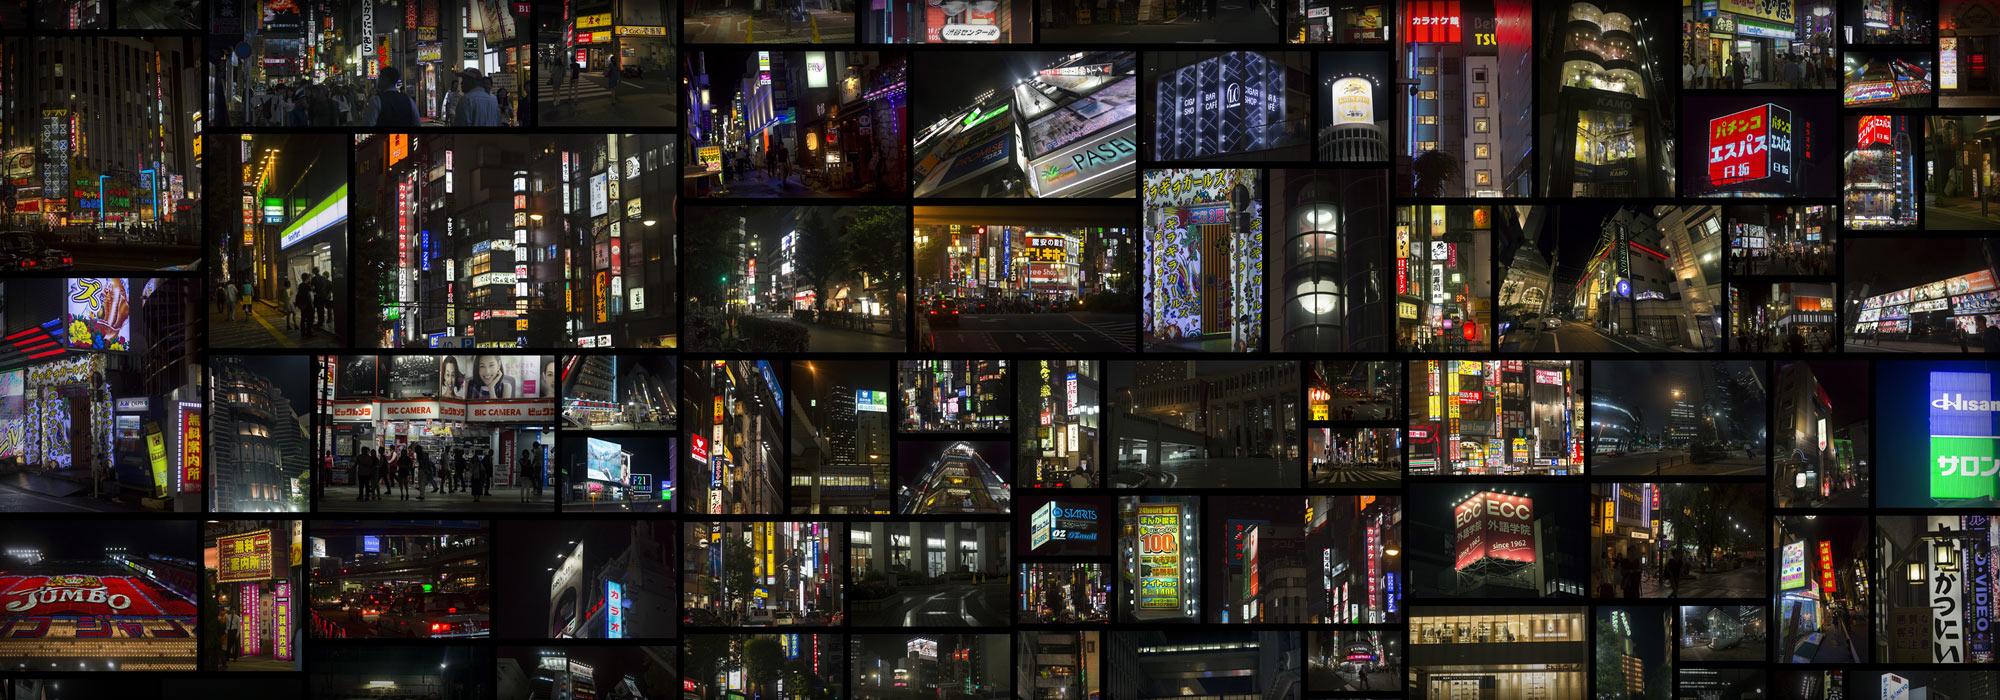 Tokyo Cyberpunk Neon City Night